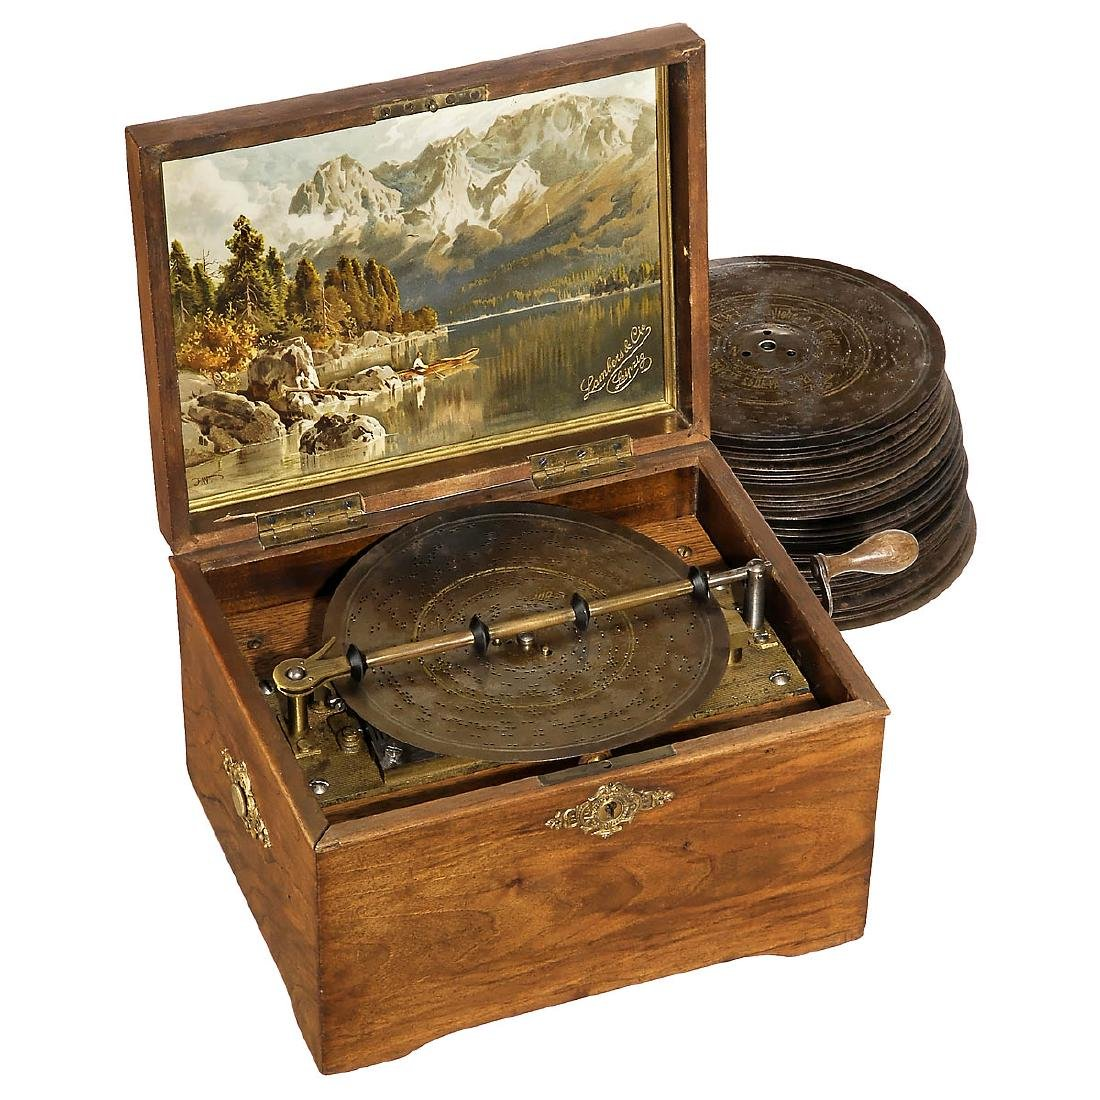 Symphonion 7 3/8-inch Disc Musical Box, c. 1898